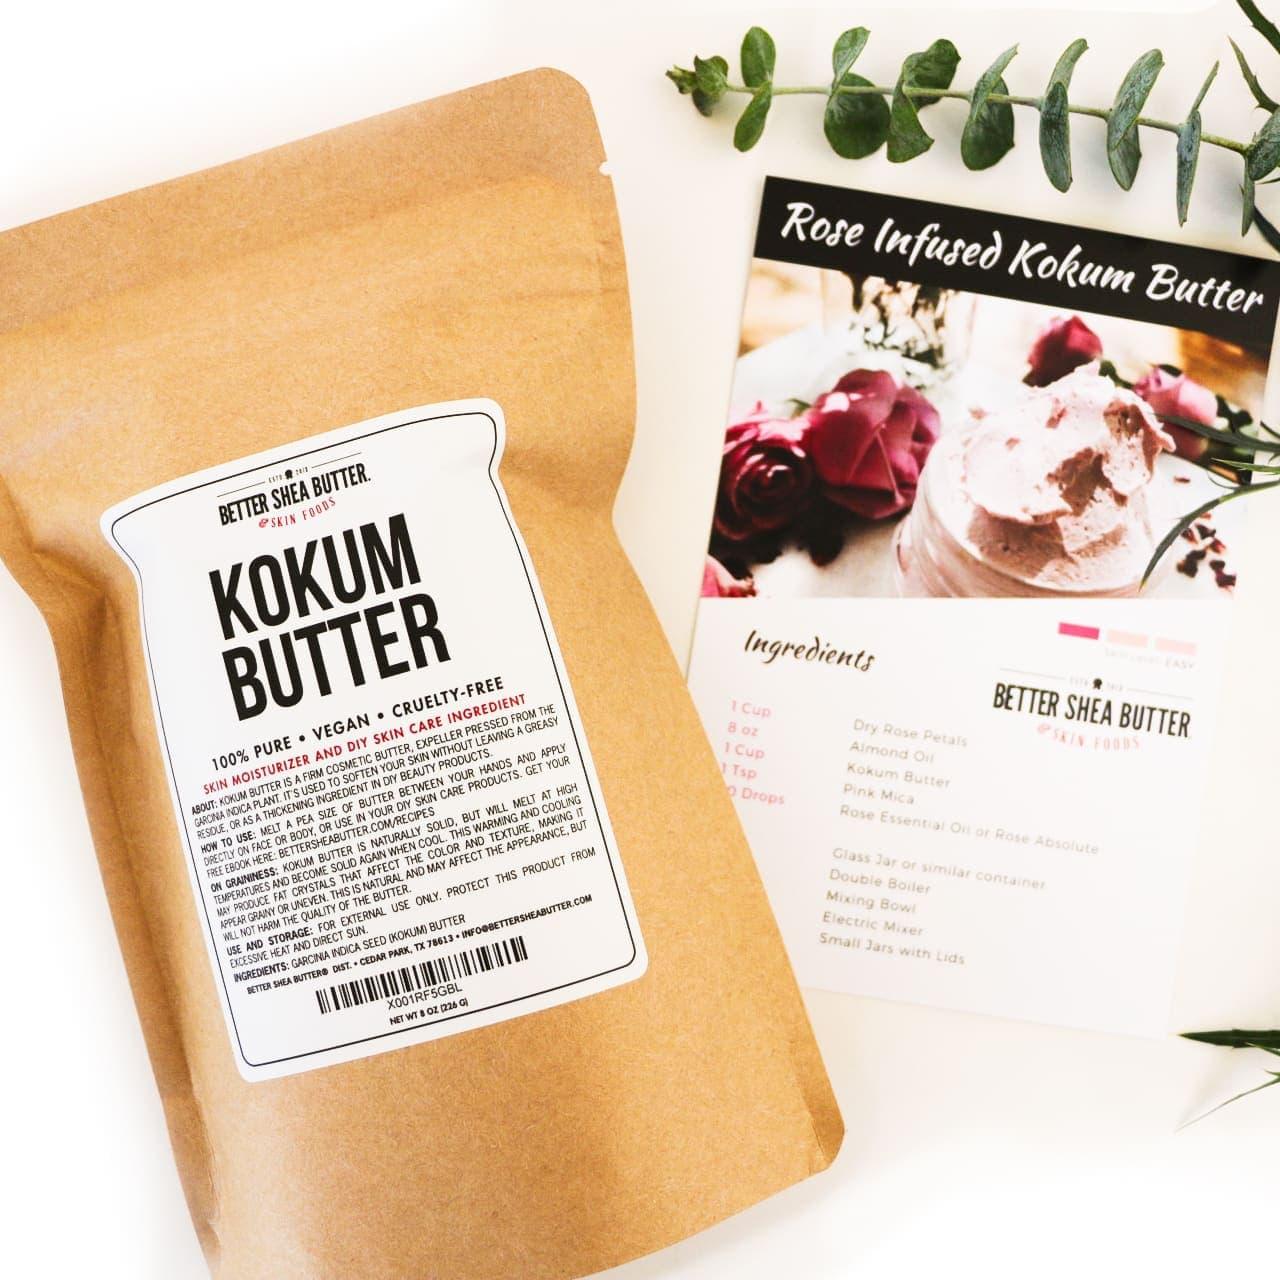 rose infused kokum butter kit